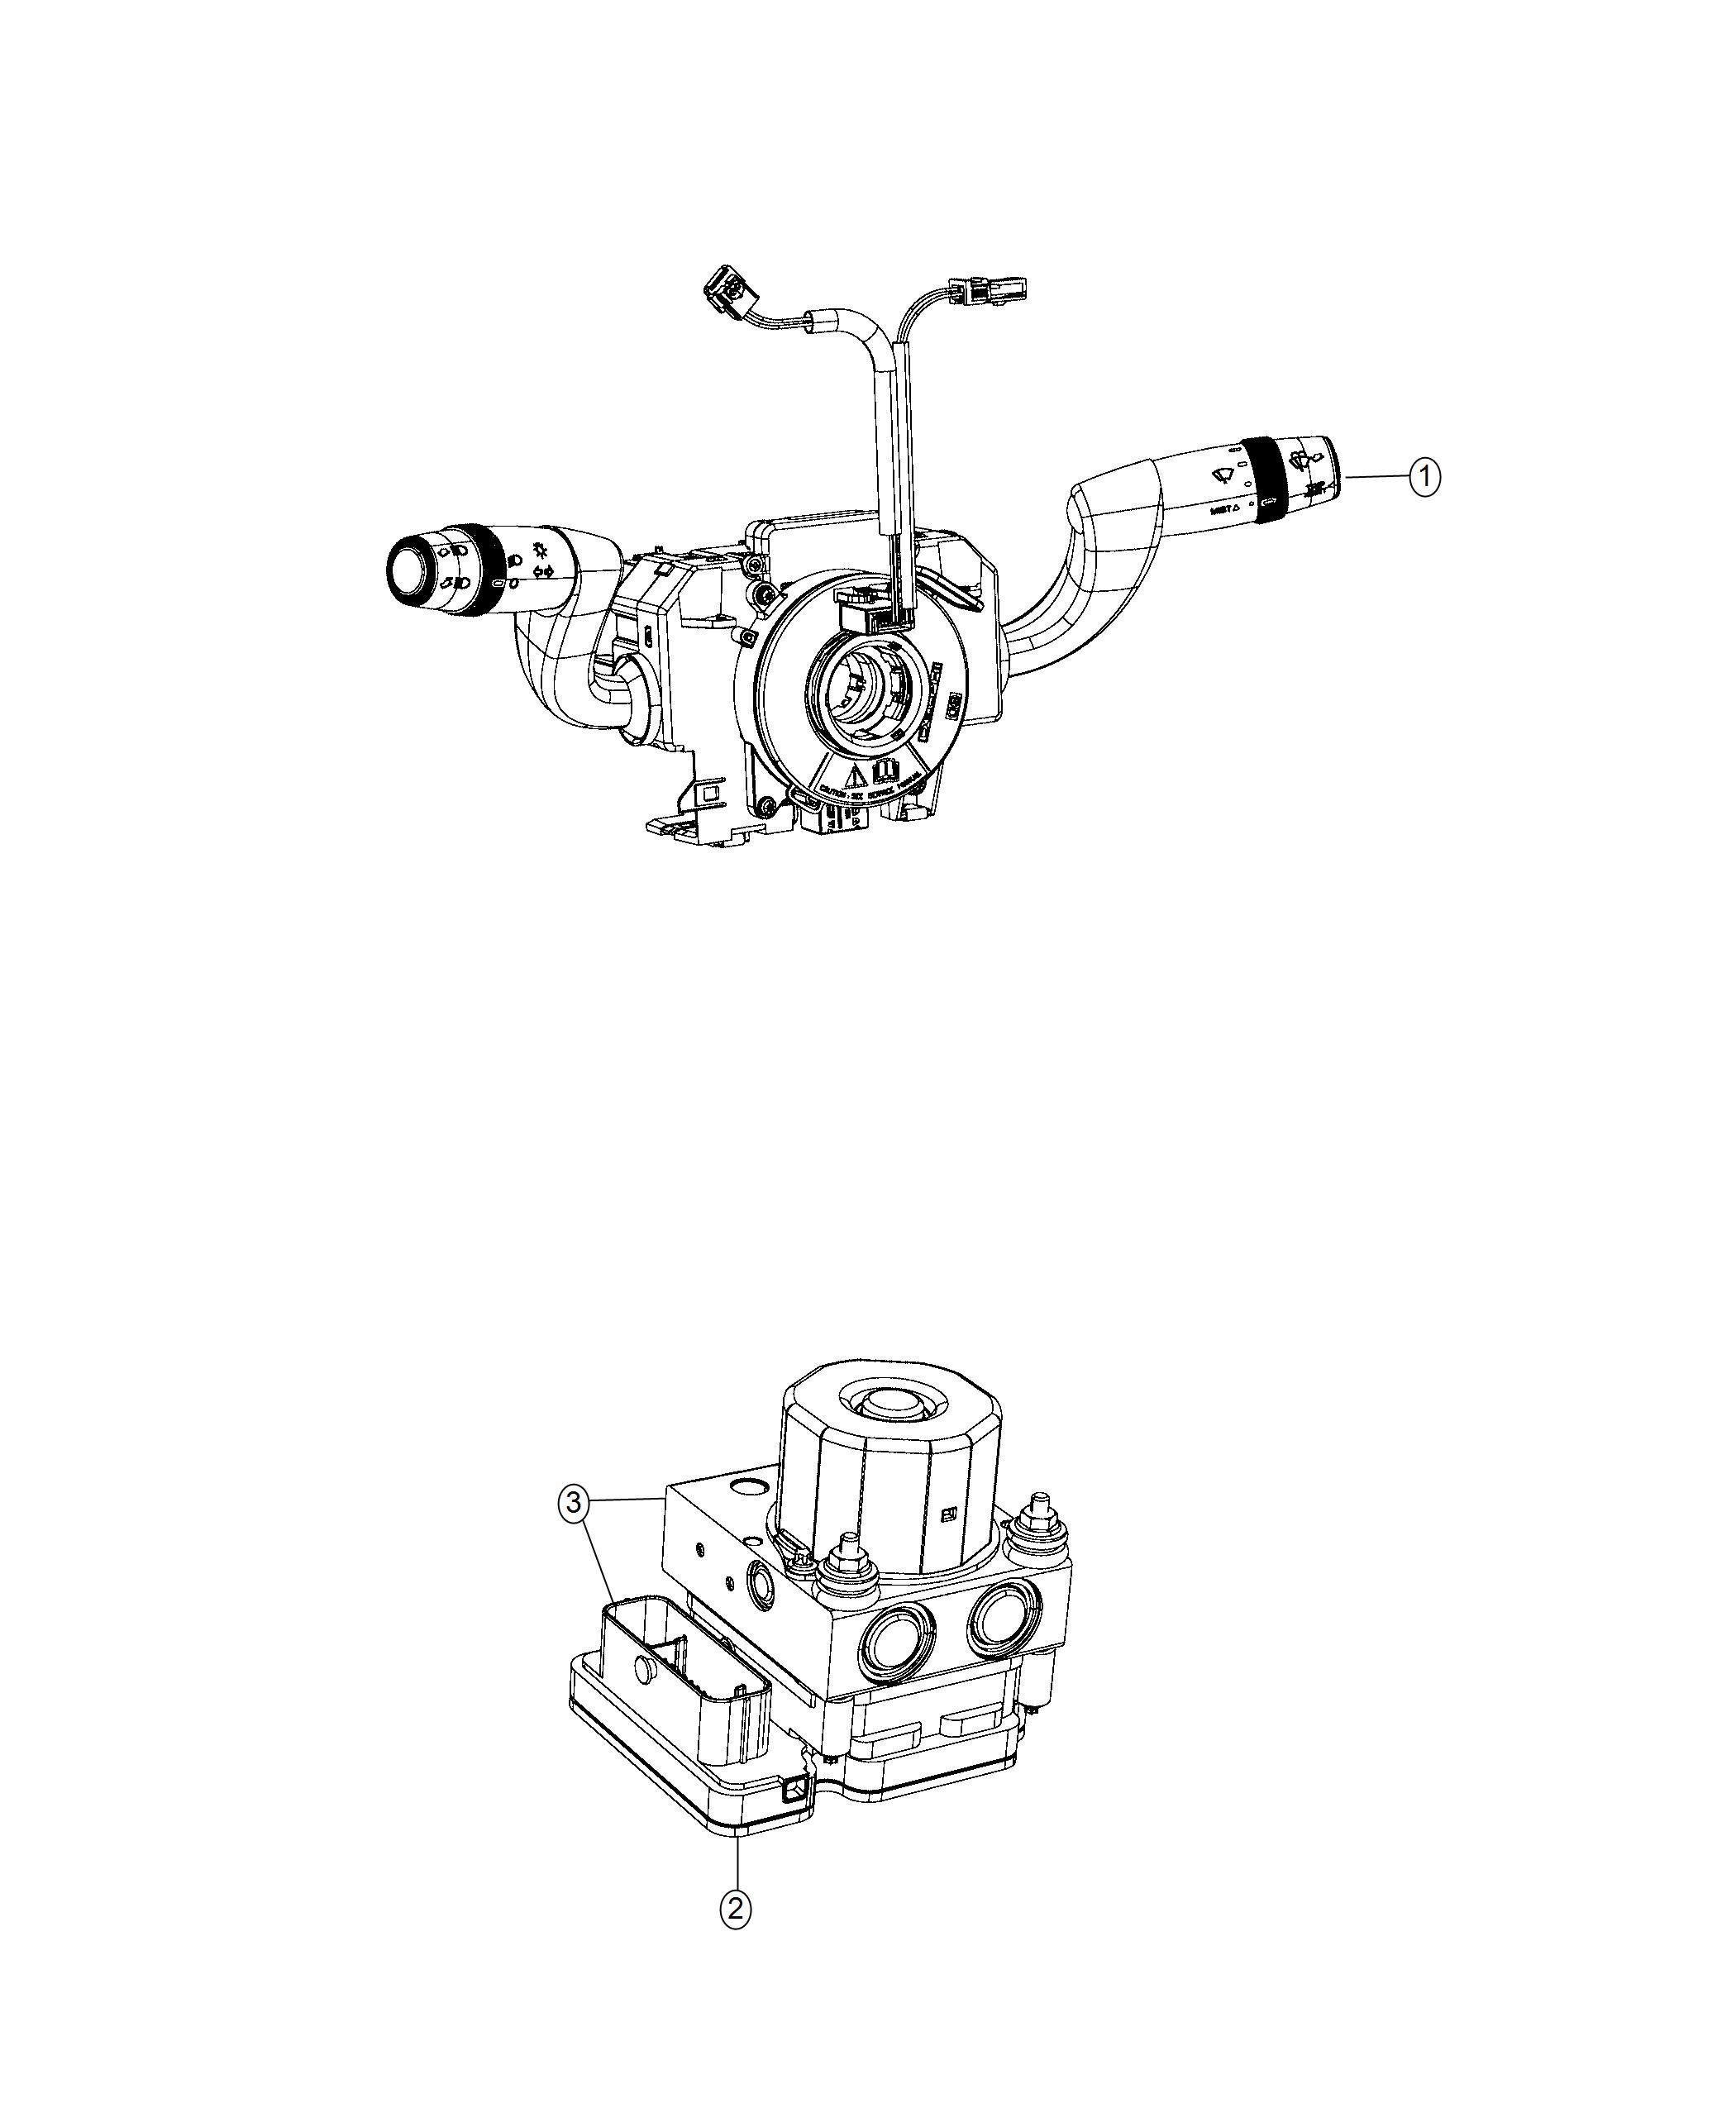 Ram Promaster City Wagon Module Steering Control St Trim No Description Available